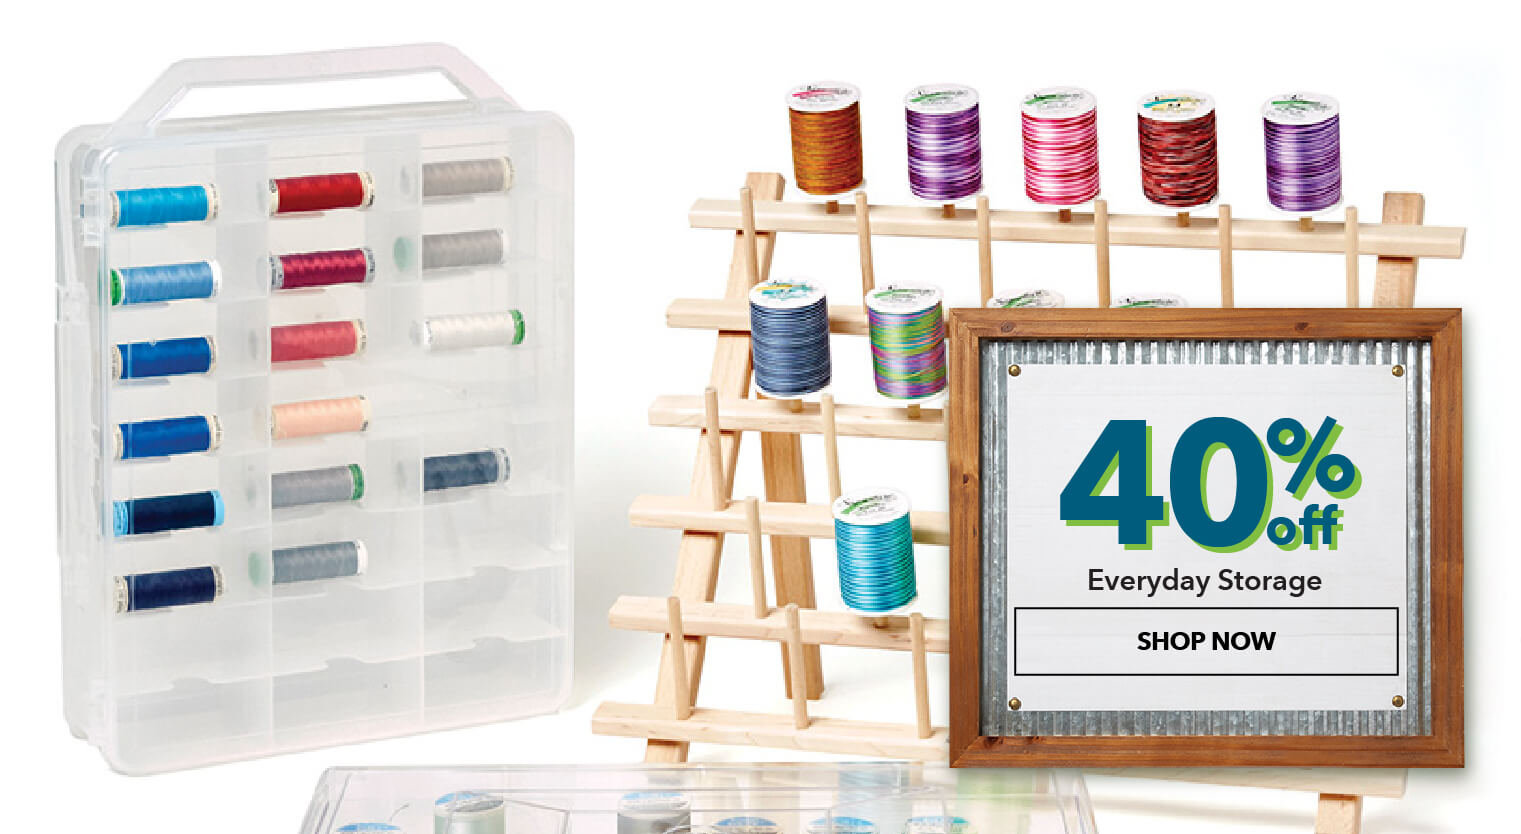 40% Everyday Storage. Shop Now.